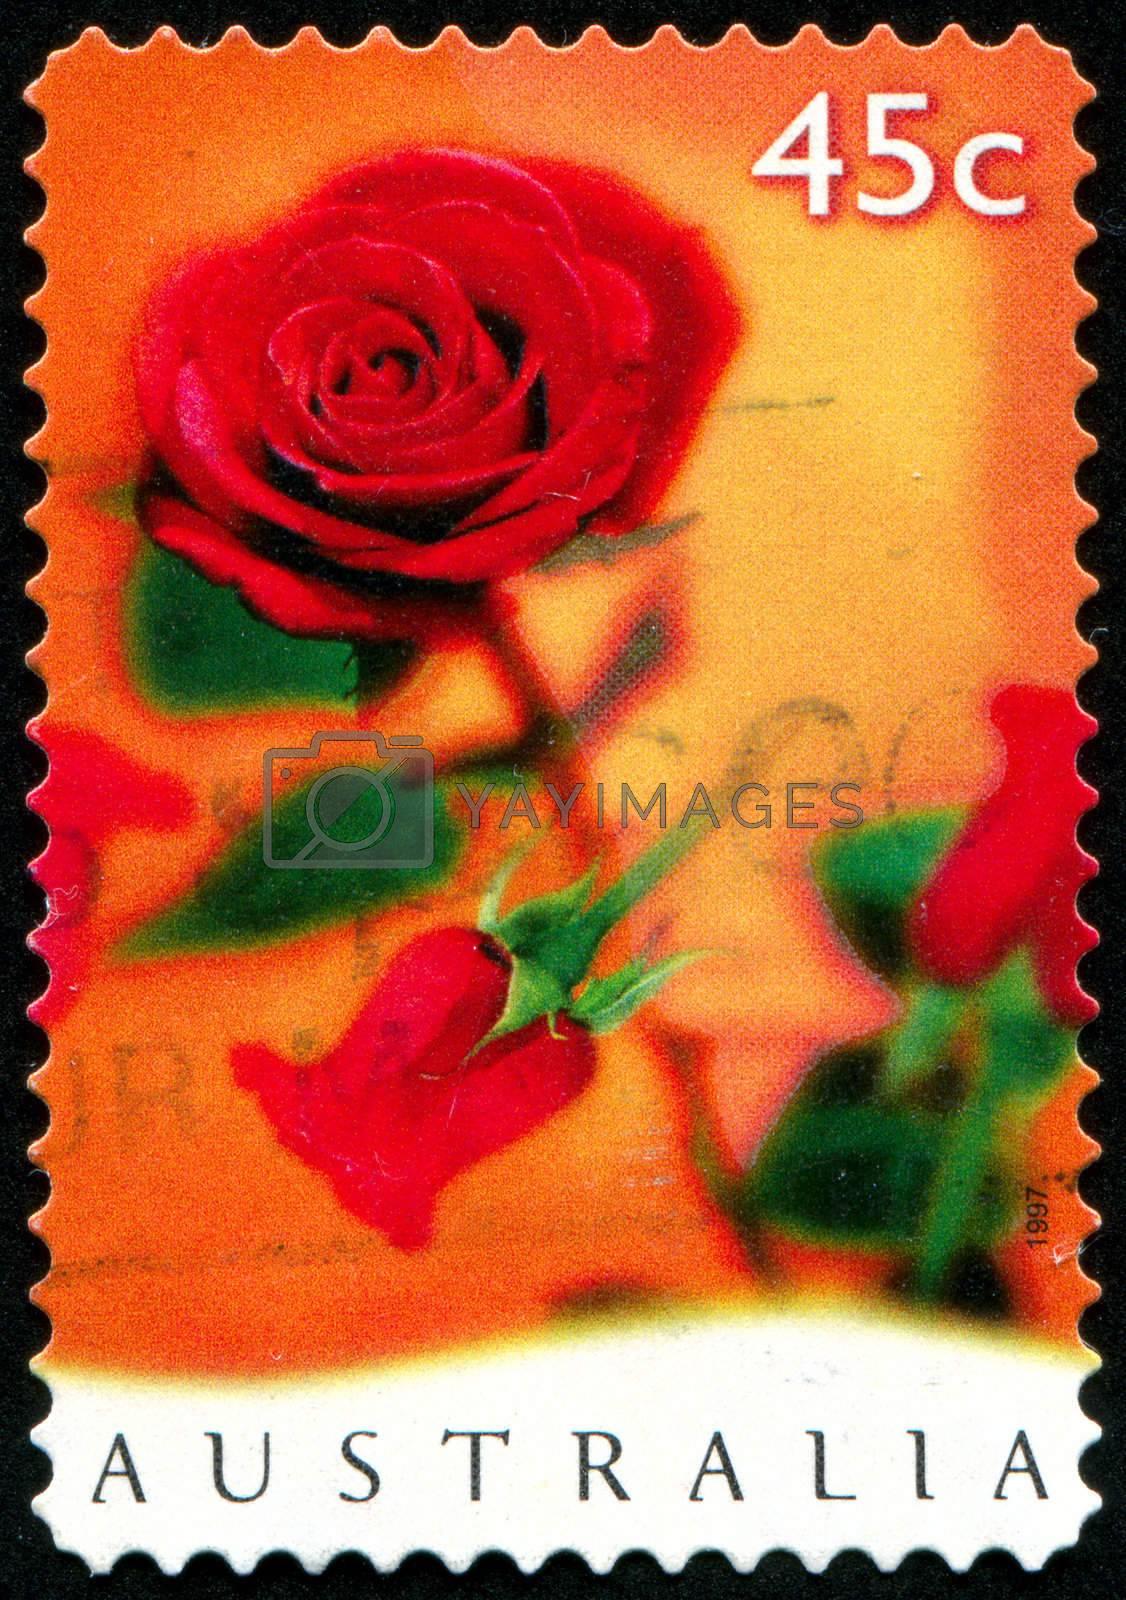 AUSTRALIA - CIRCA 1997: stamp printed by Australia, shows rose, circa 1997